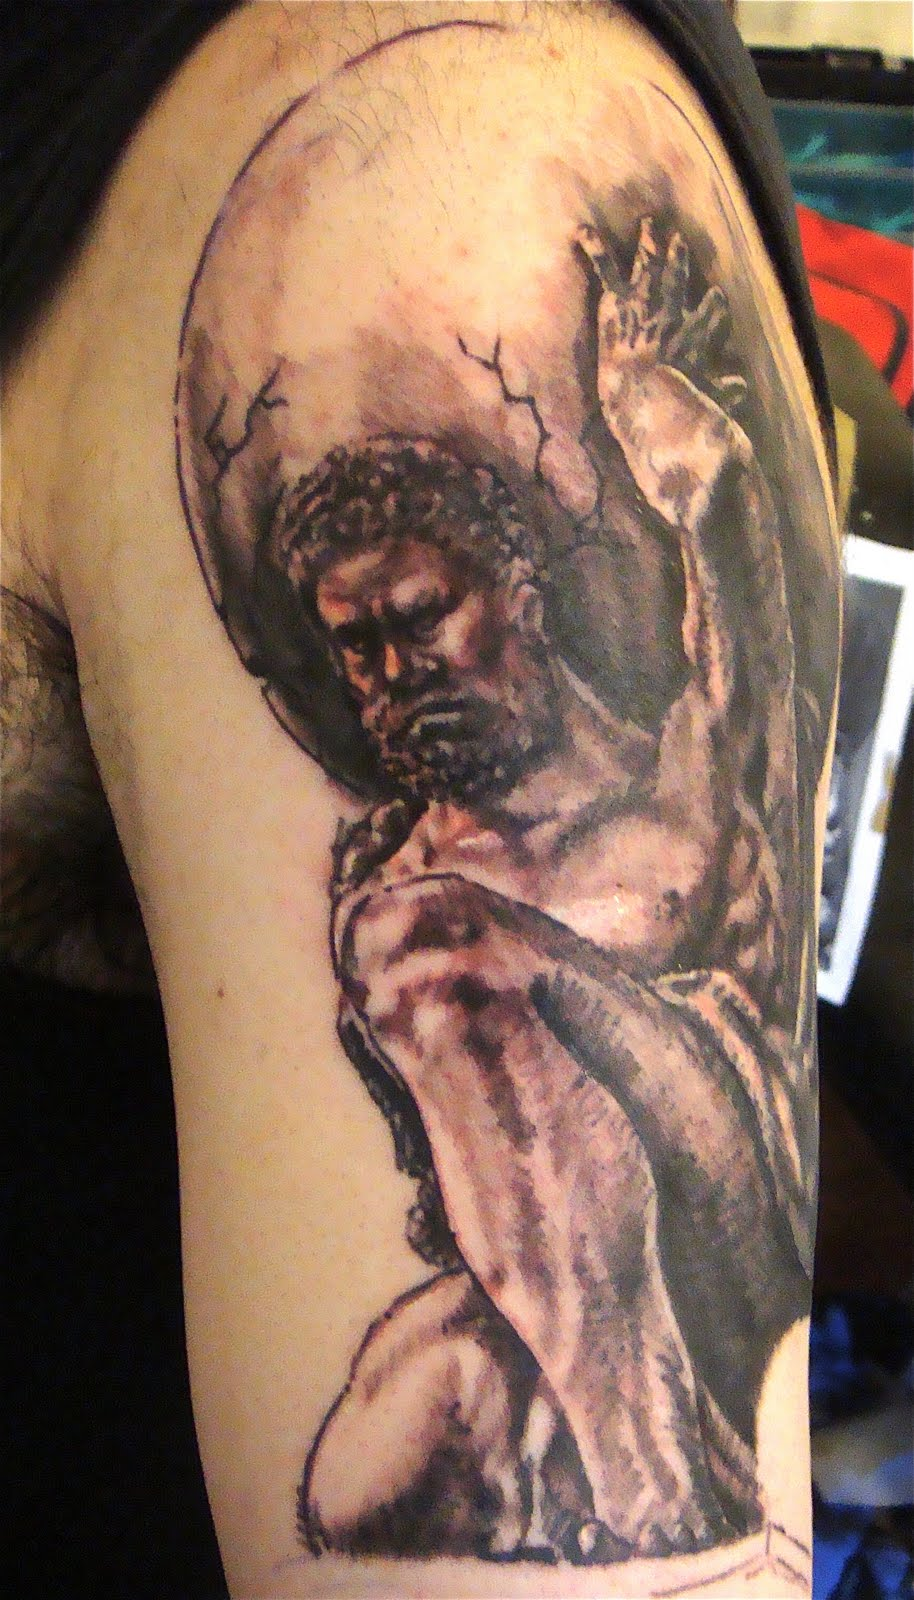 Submundo tattoos body piercing atlas work in progress for Weightlifting tattoo designs